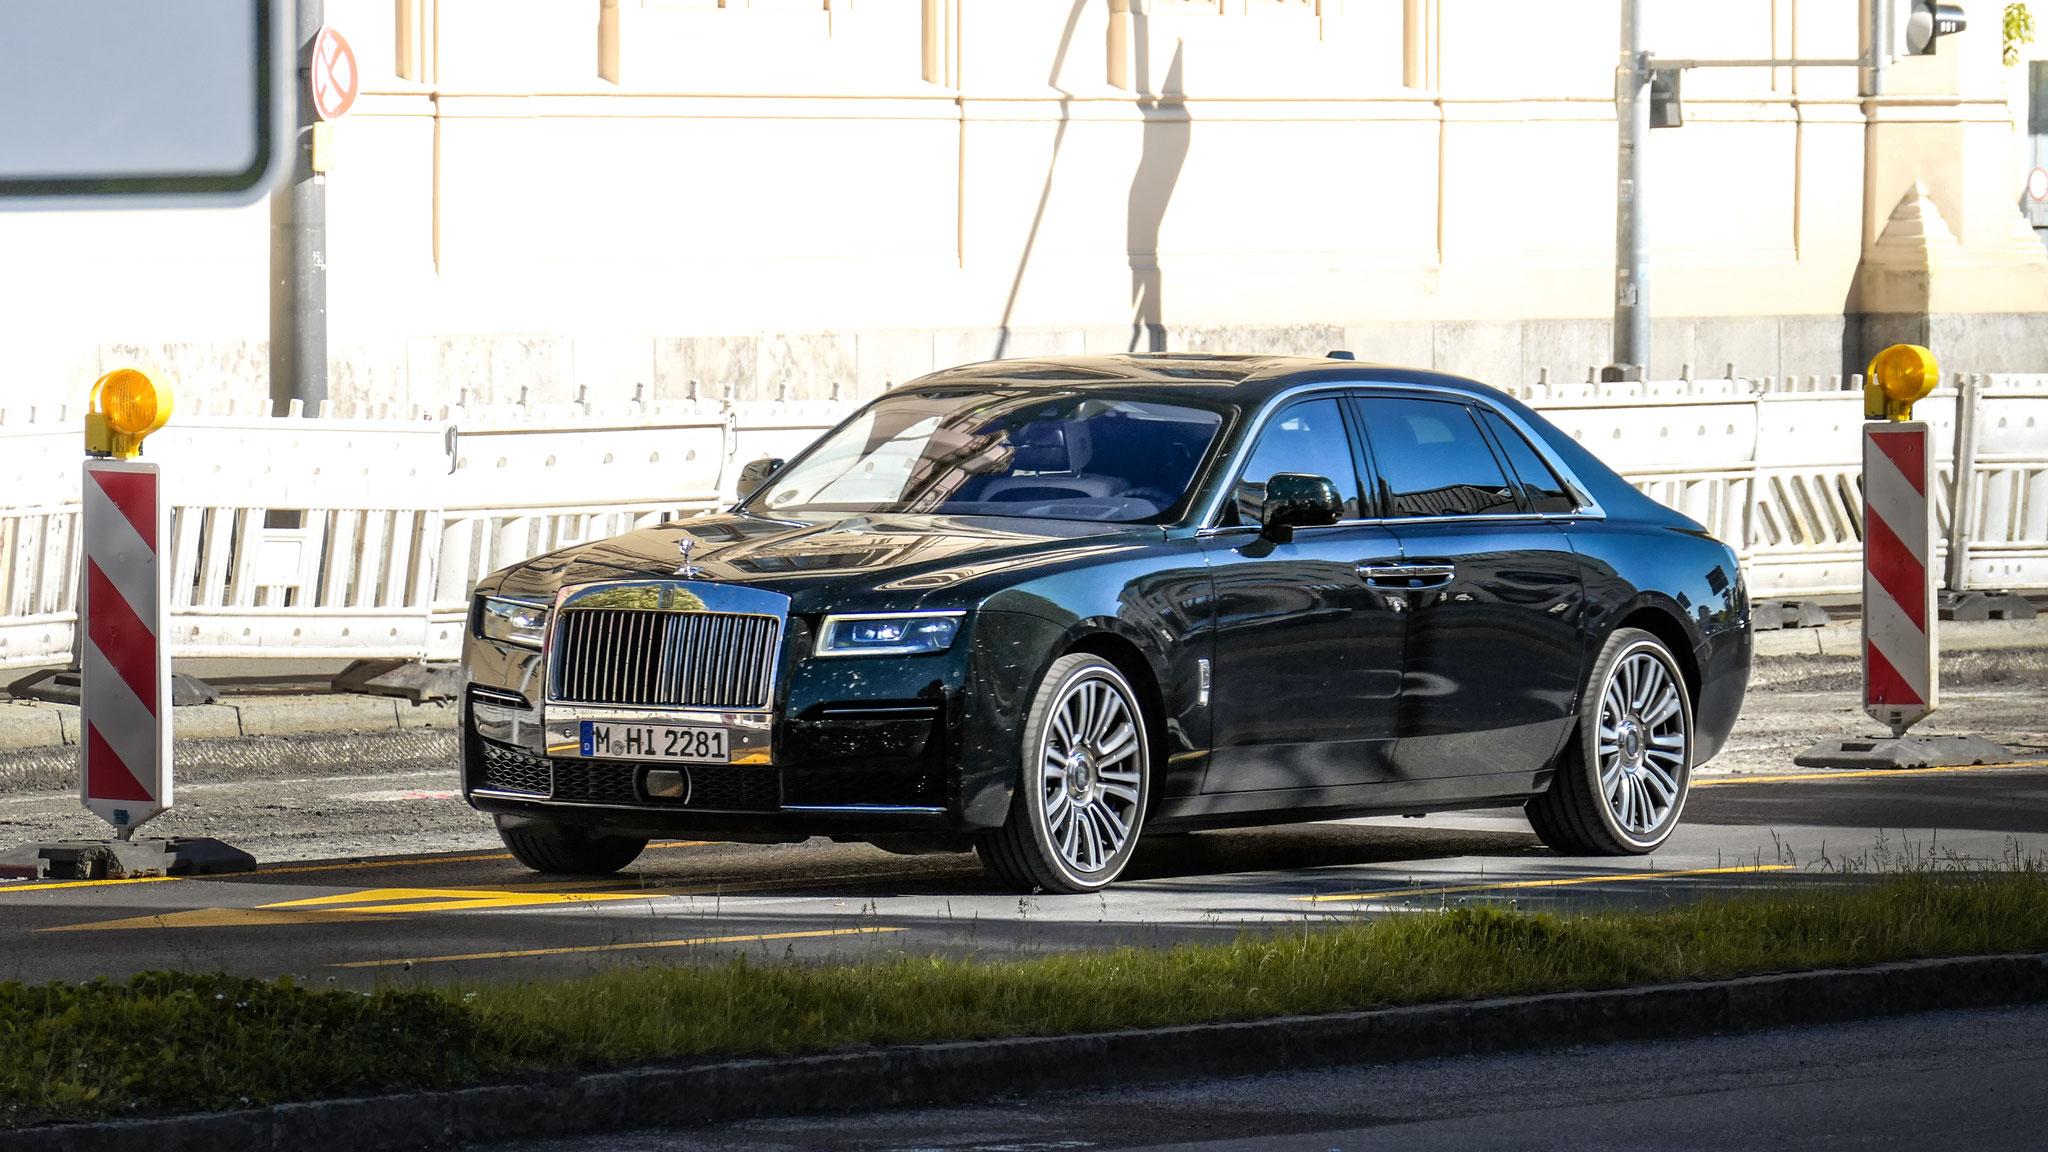 Rolls Royce Ghost - M-HI-2281